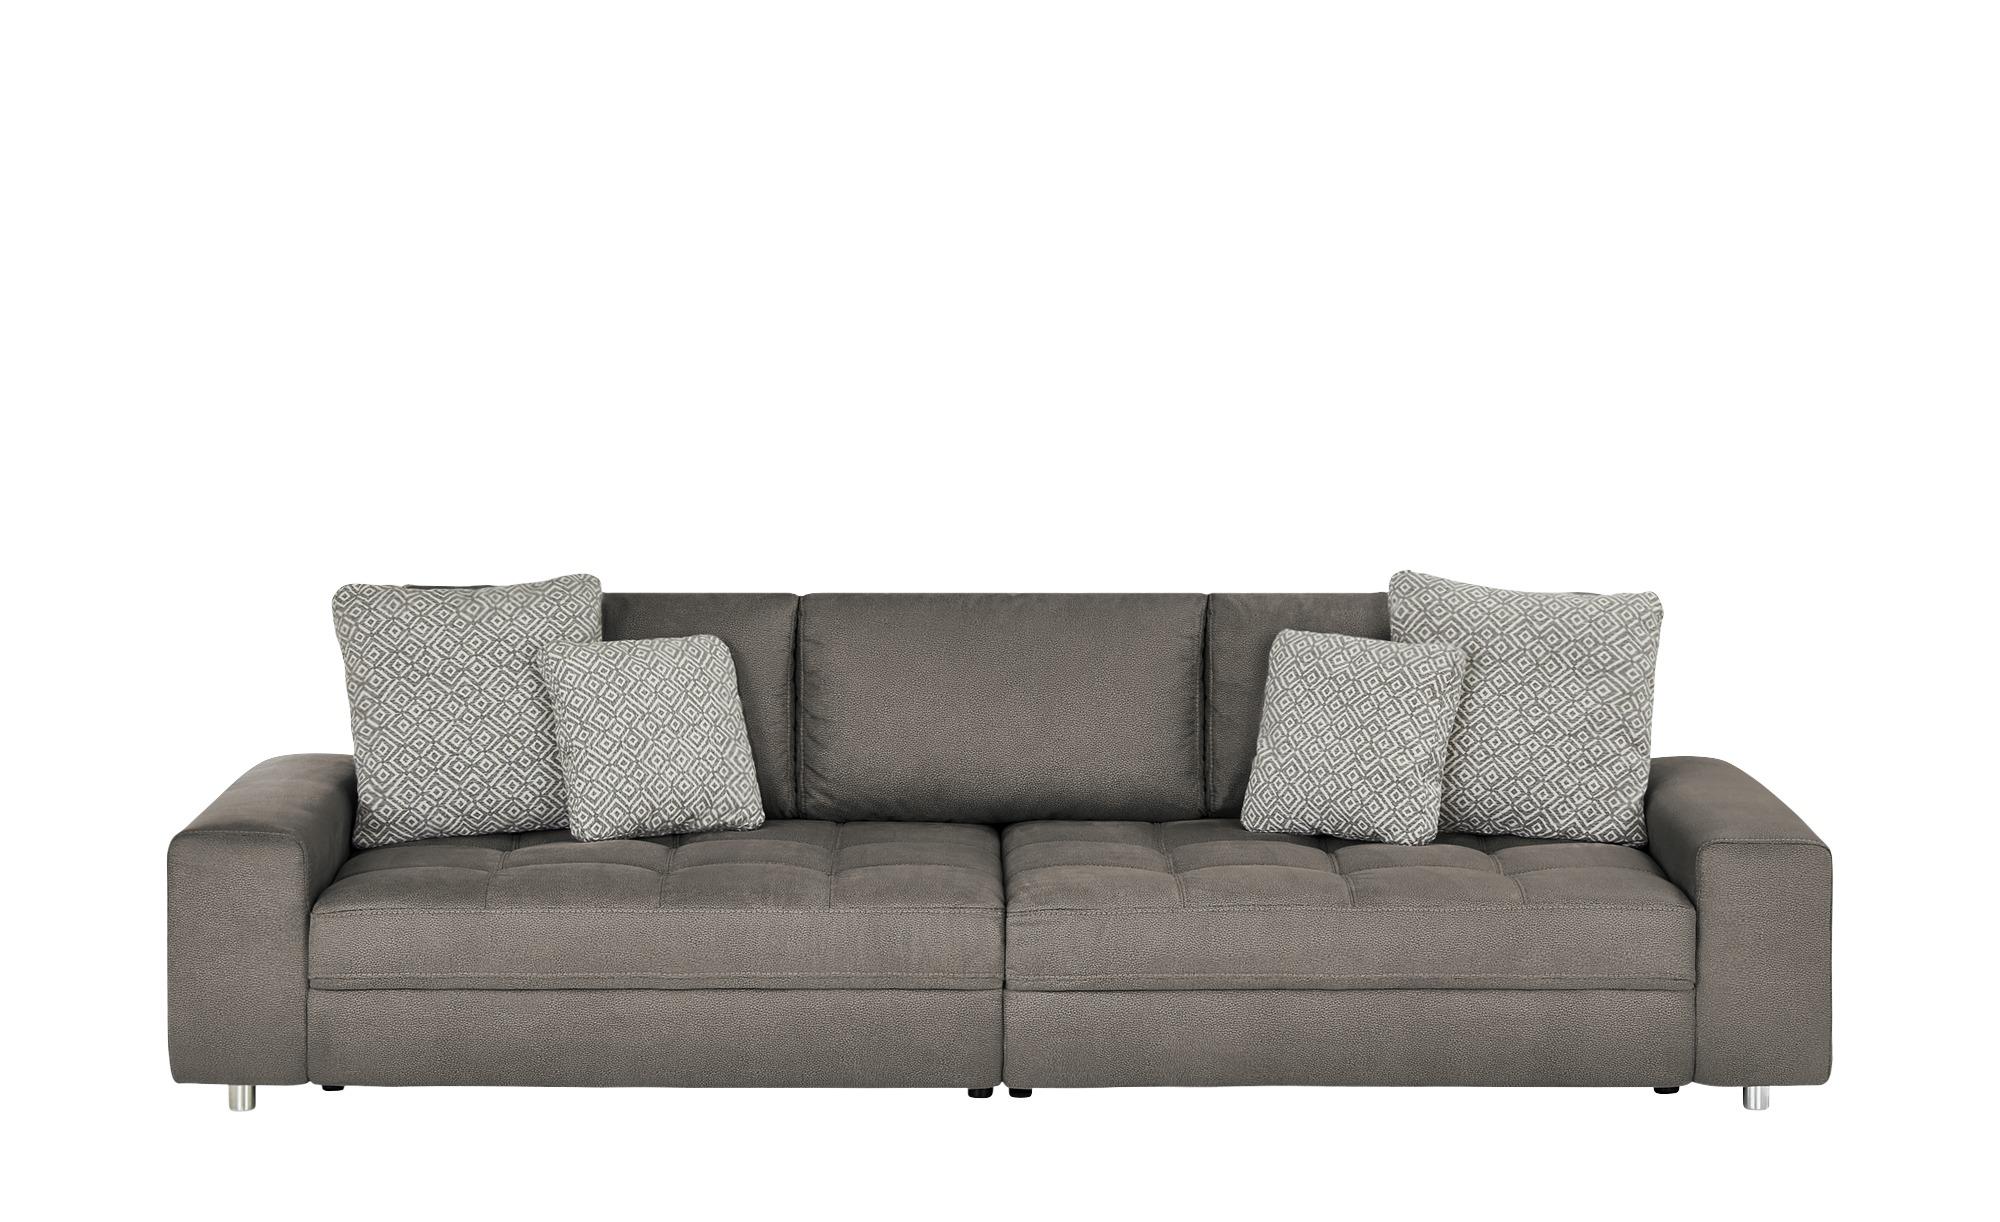 bobb Big Sofa  Arissa ¦ grau Polstermöbel > Sofas > Big-Sofas - Höffner günstig online kaufen